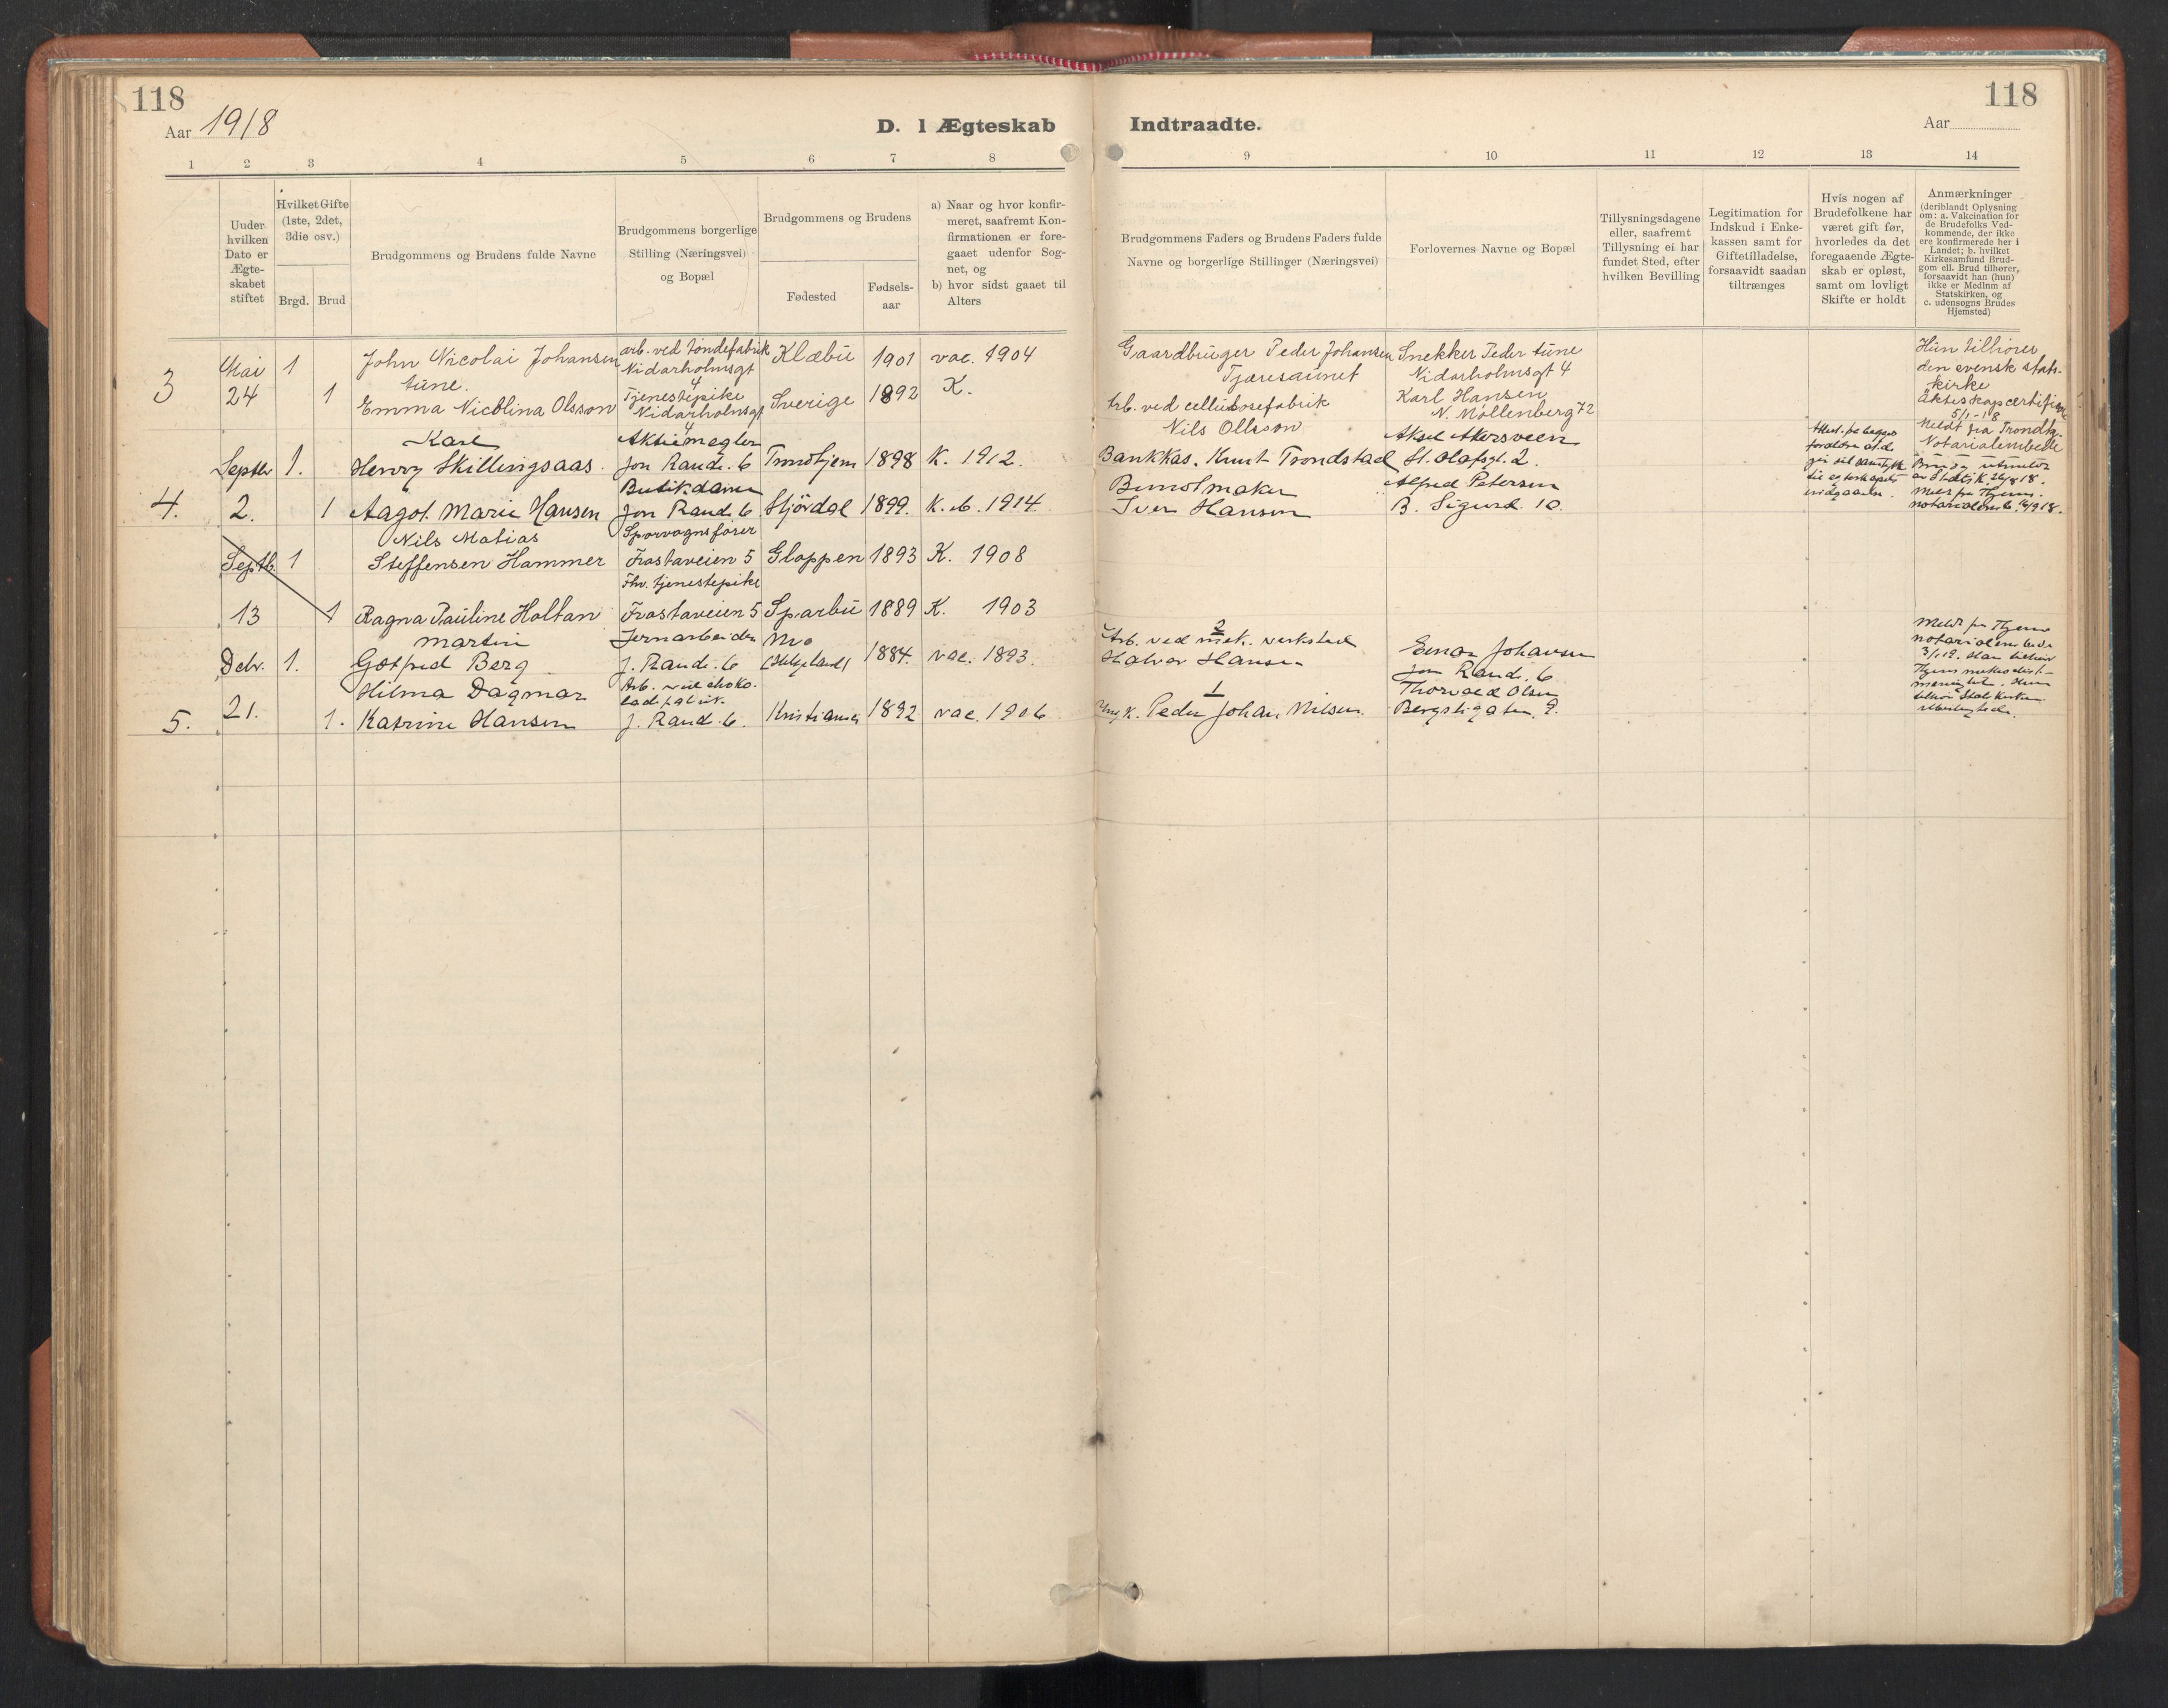 SAT, Ministerialprotokoller, klokkerbøker og fødselsregistre - Sør-Trøndelag, 605/L0244: Parish register (official) no. 605A06, 1908-1954, p. 118